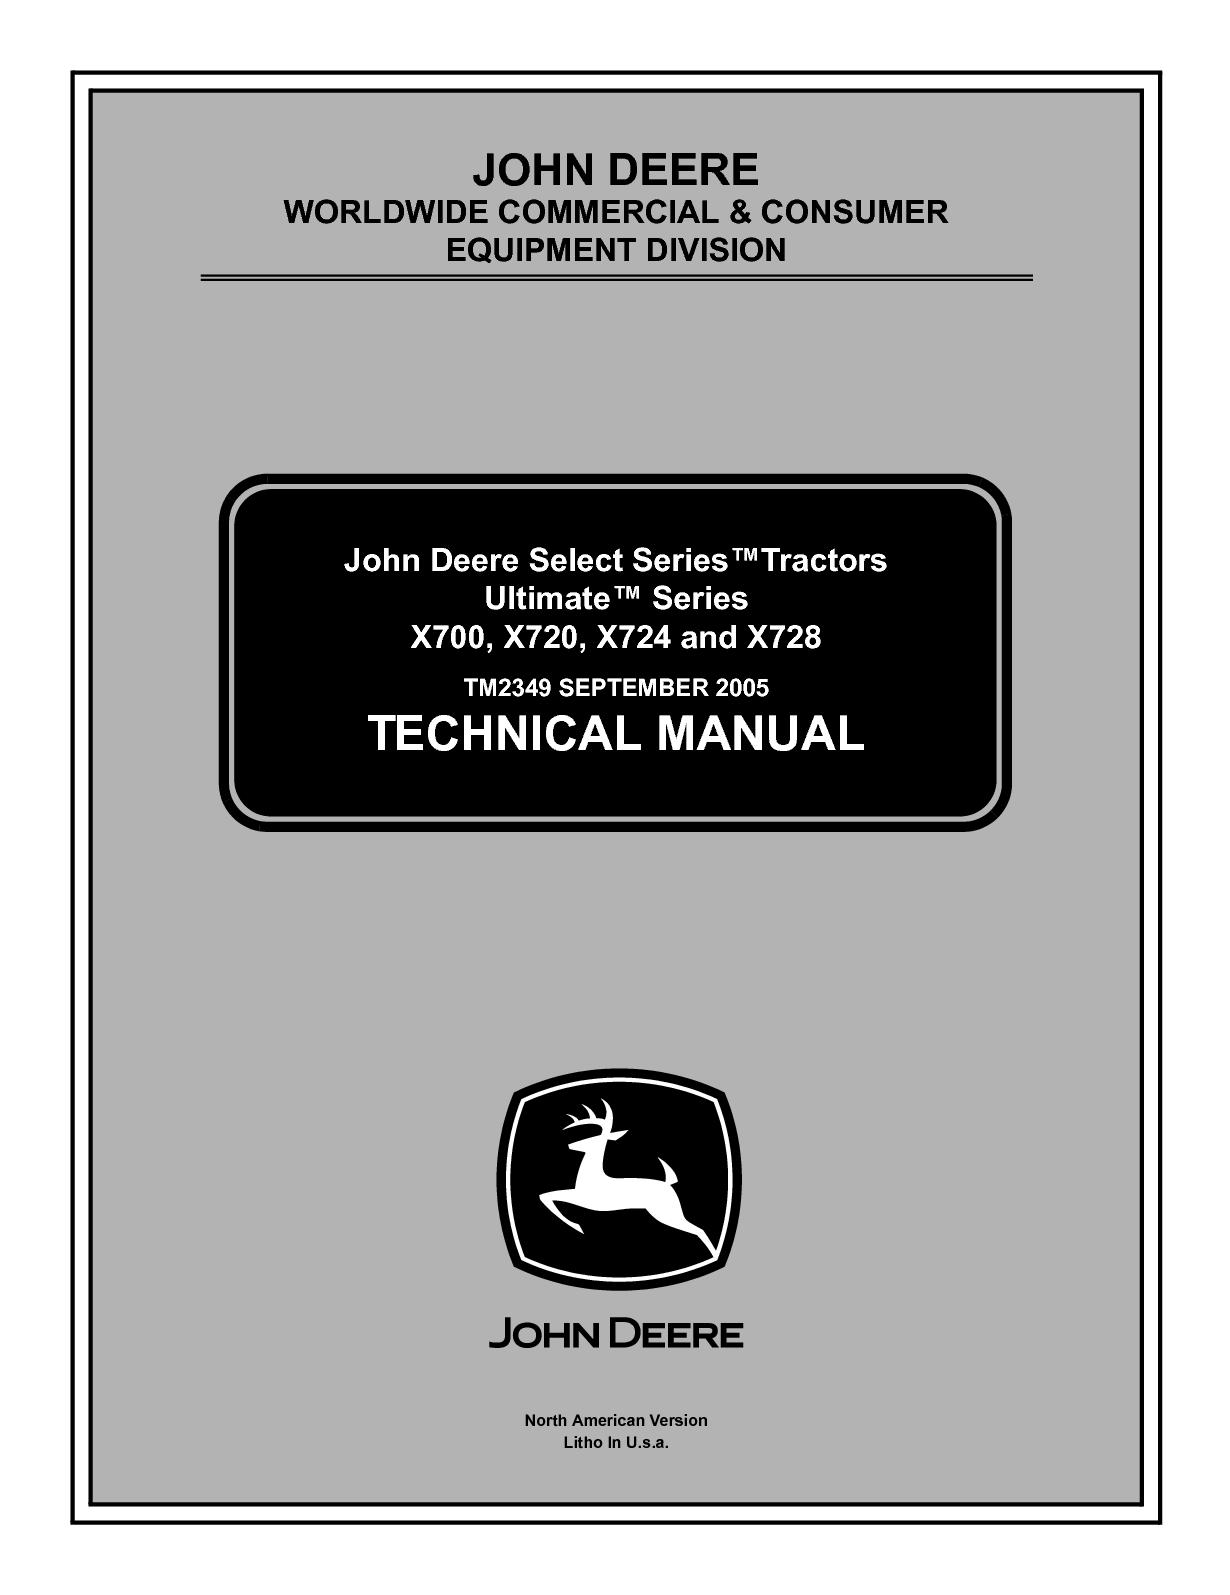 John Deere Tractor Service Manuals : Calaméo john deere lawn garden tractor service